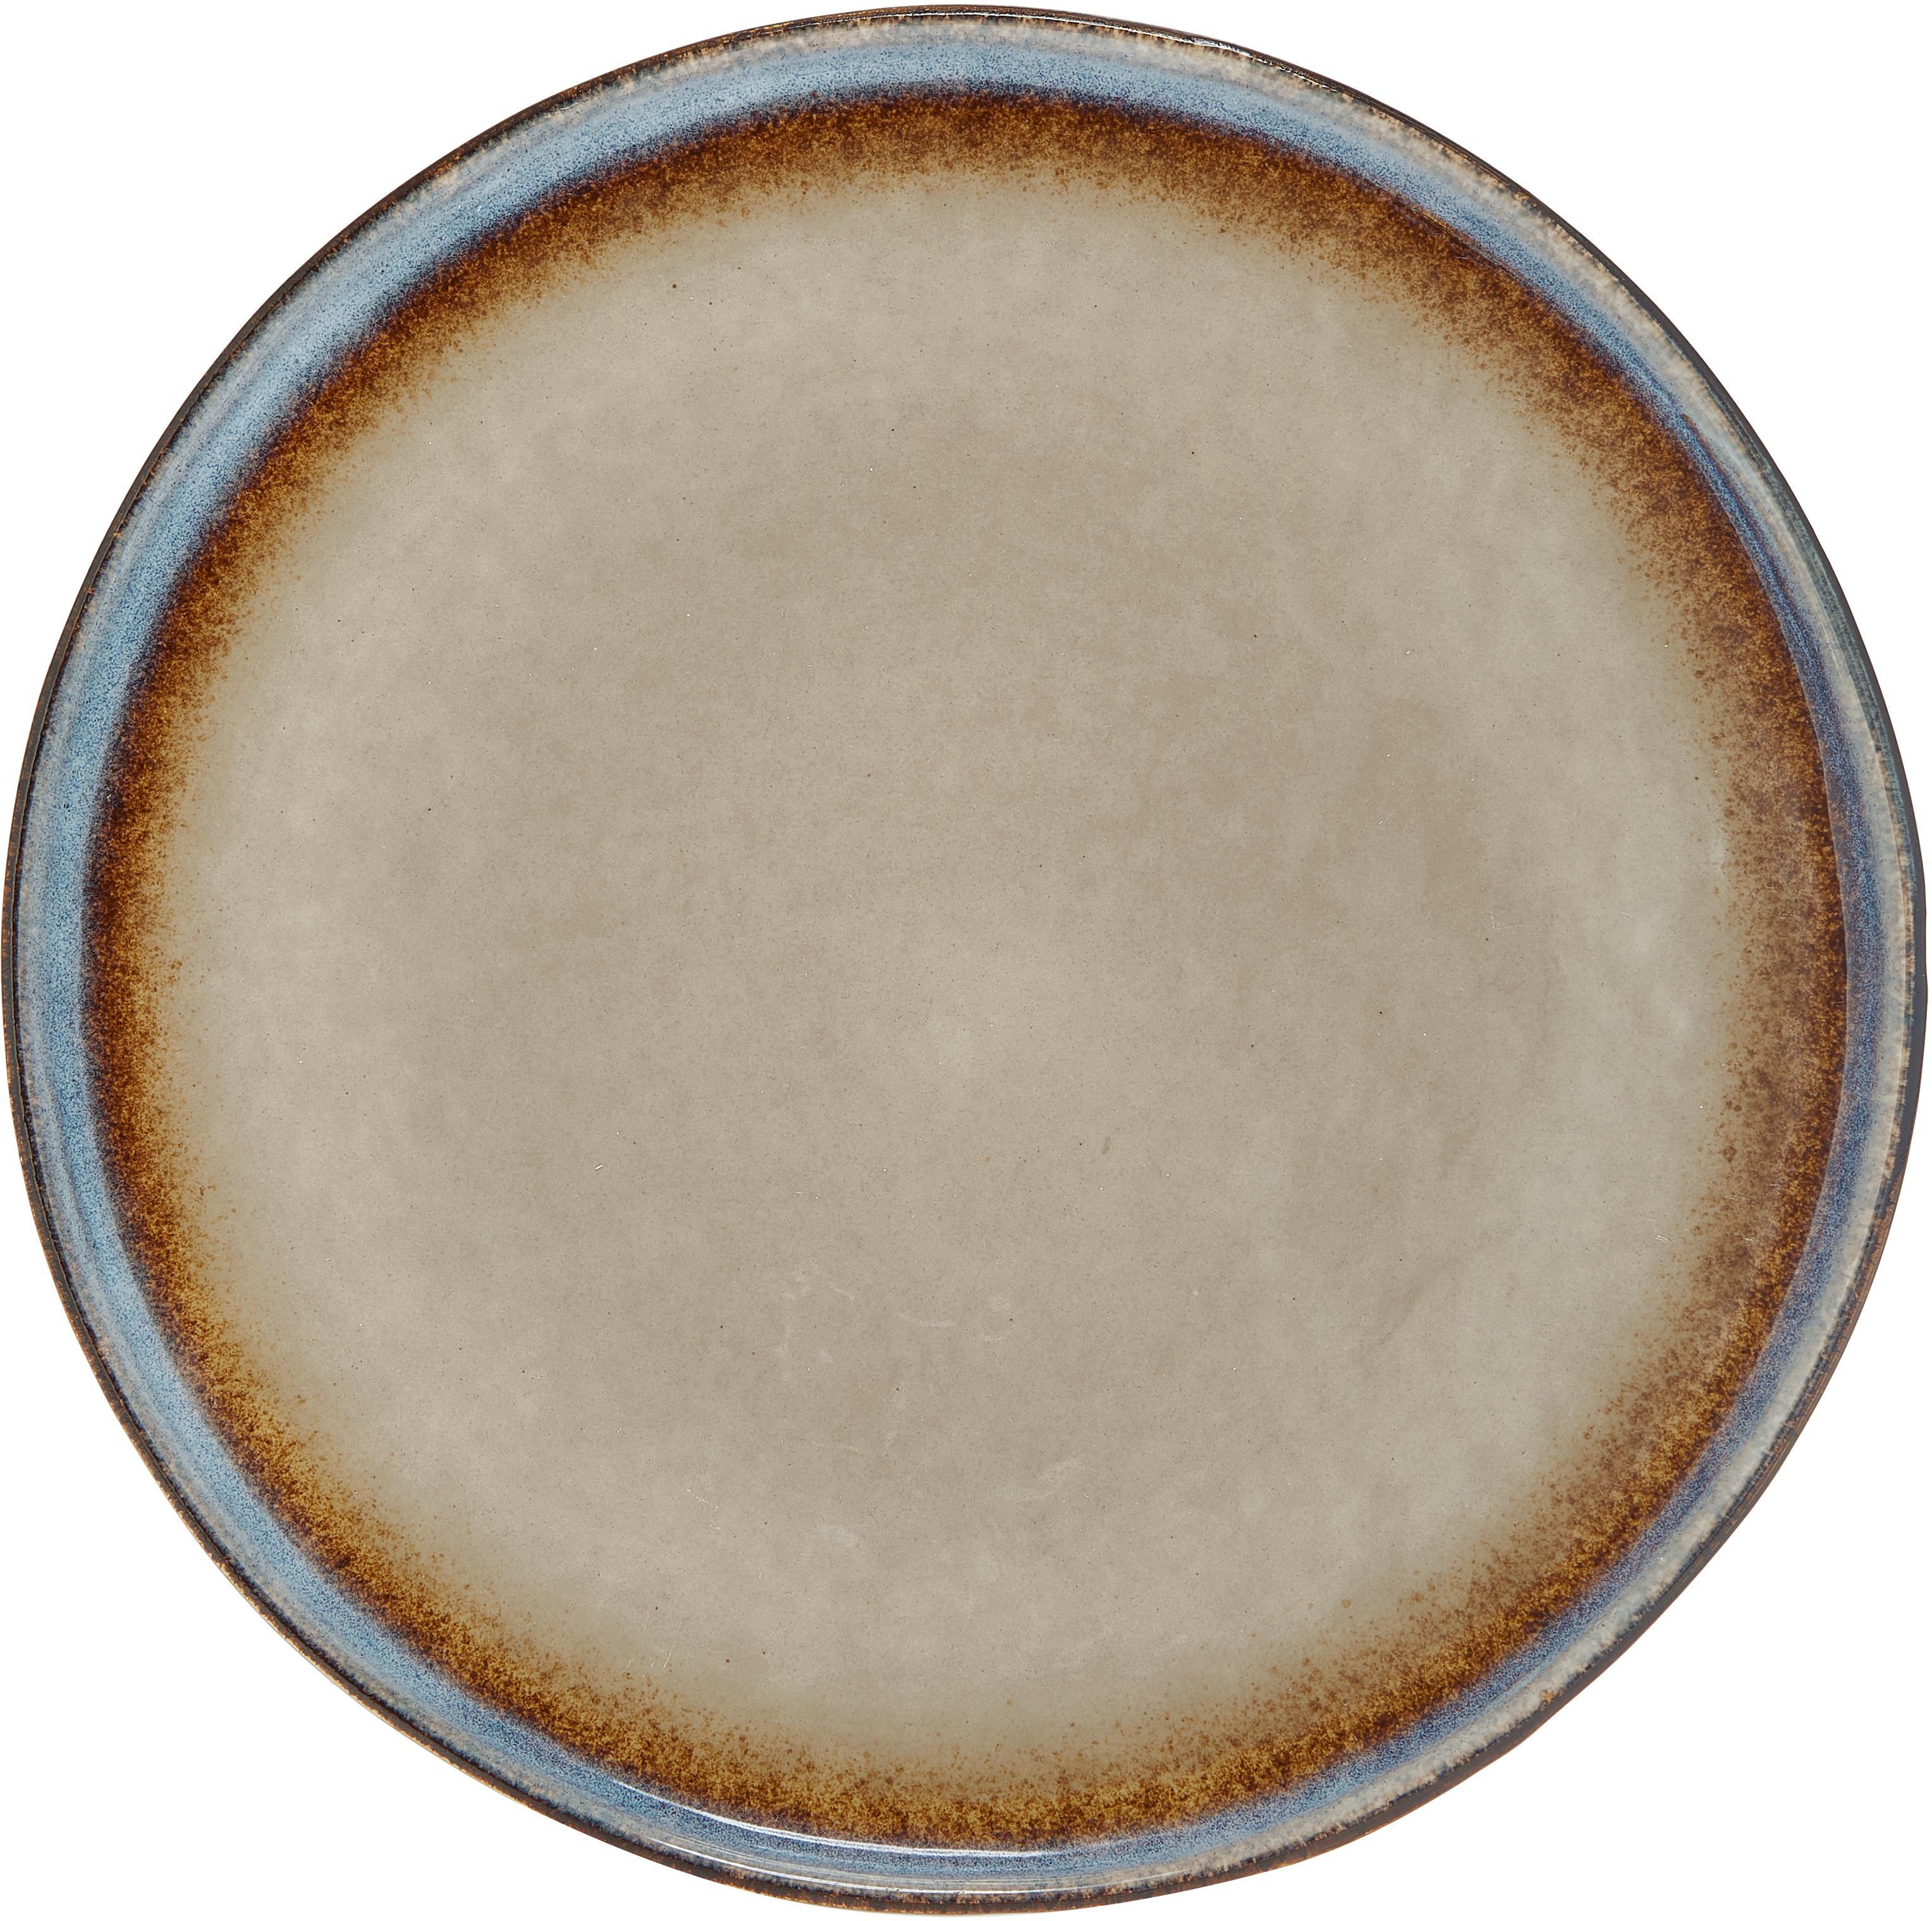 Dinerborden Nomimono, 2 stuks, Keramiek, Grijs, greige, Ø 27 cm